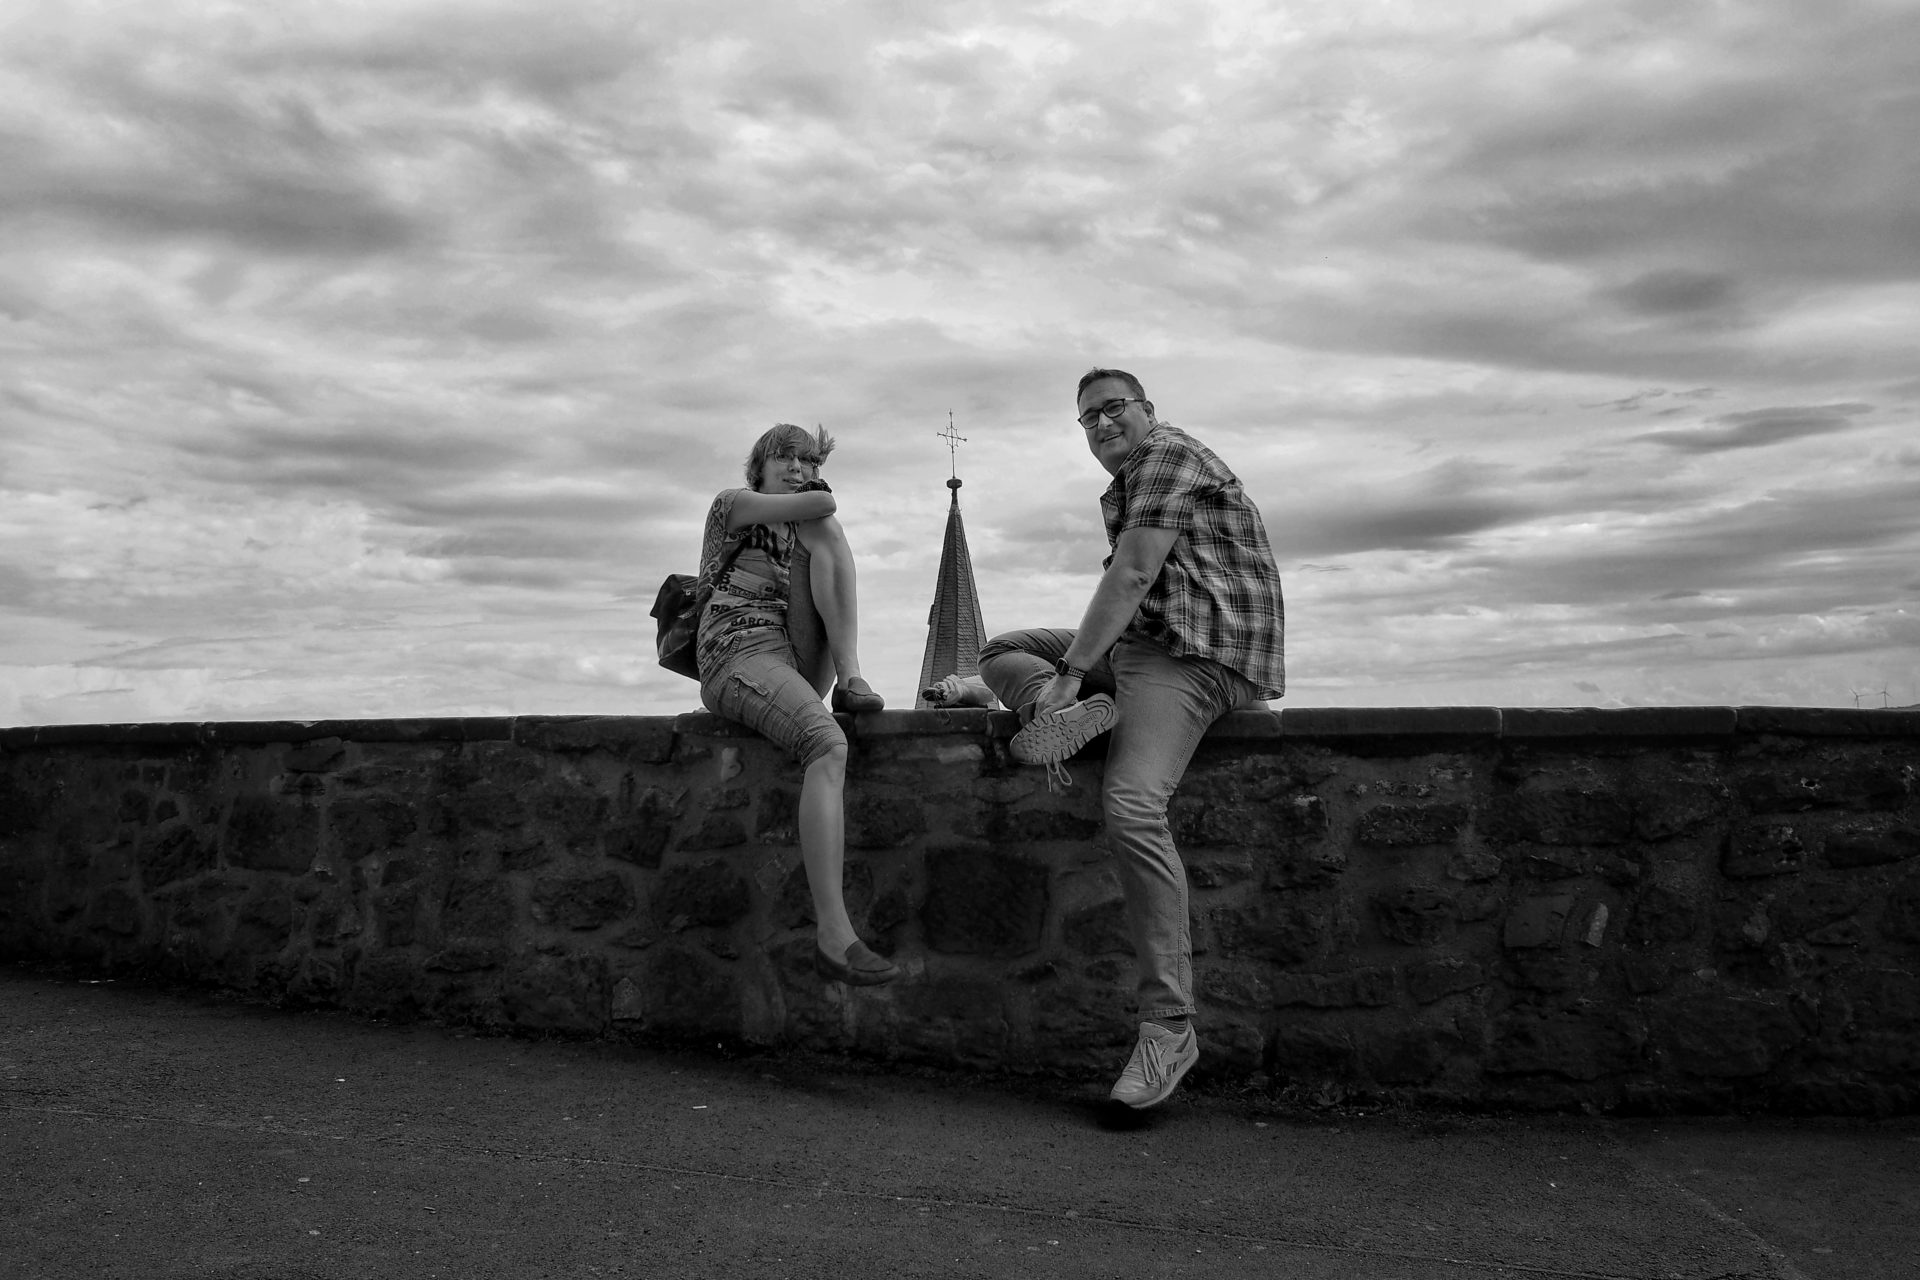 3 Blickwinkel Landgrafenschloss Marburg